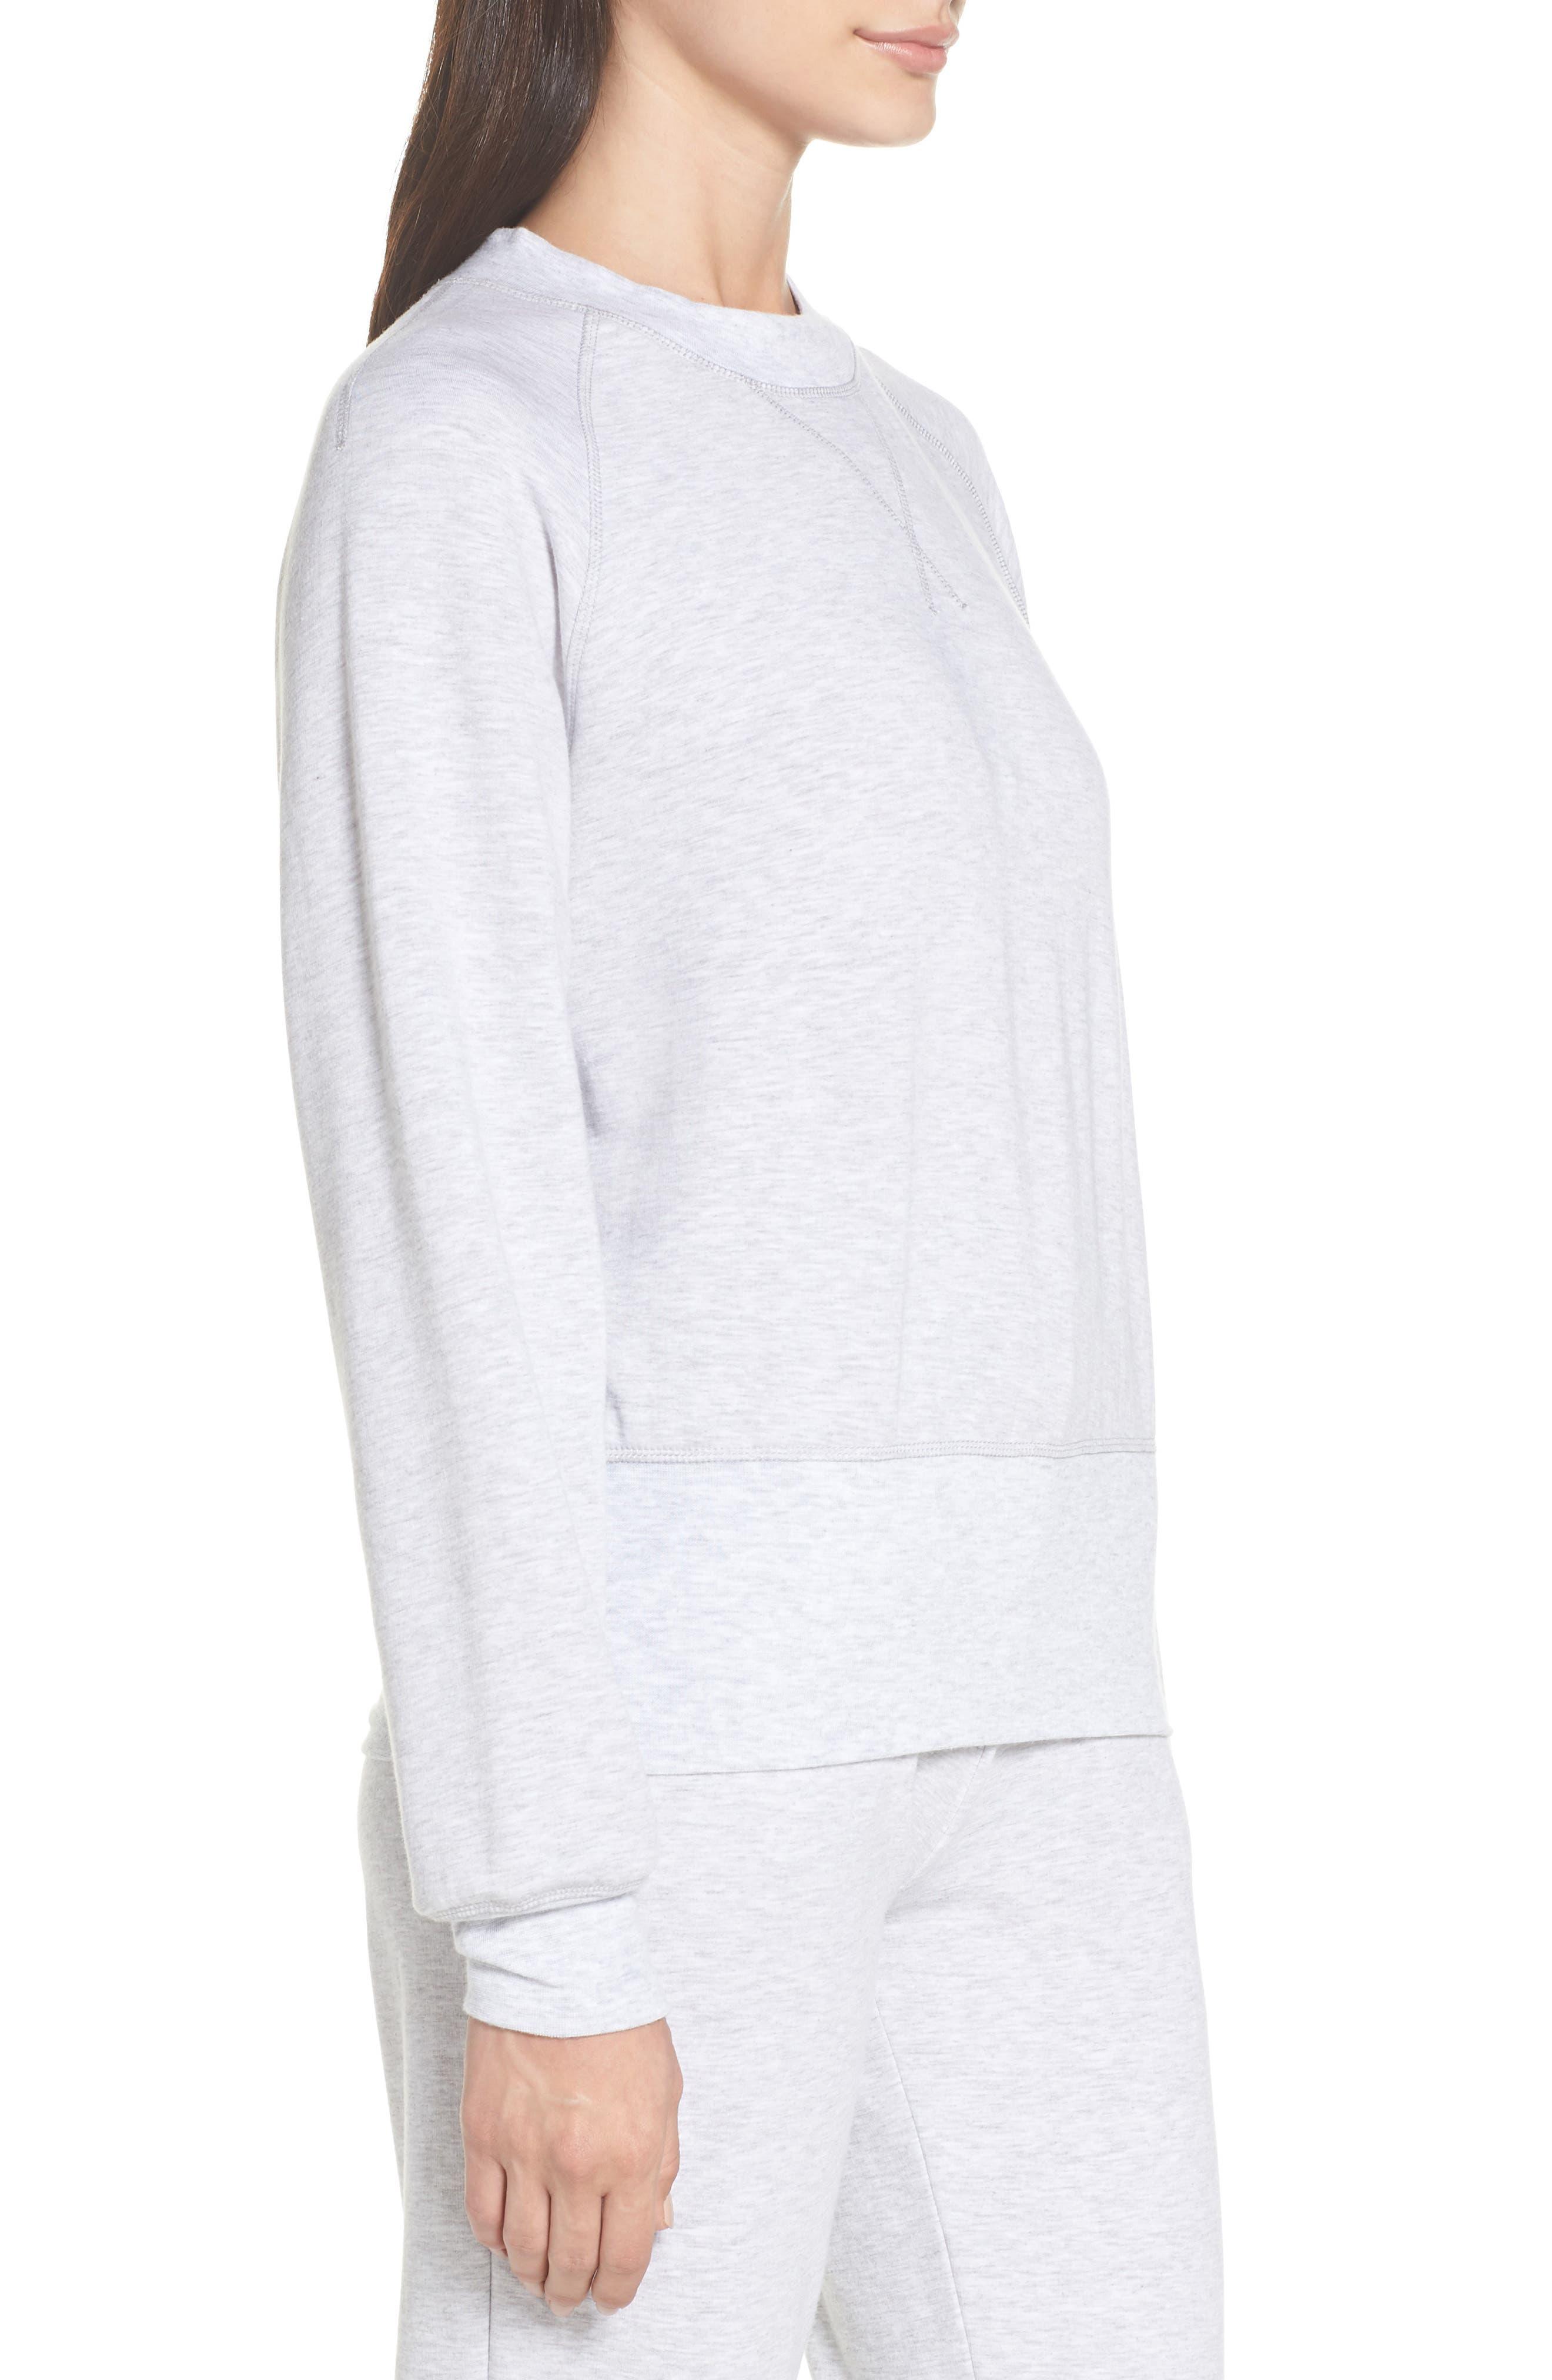 Cool Touch Sweatshirt,                             Alternate thumbnail 3, color,                             020